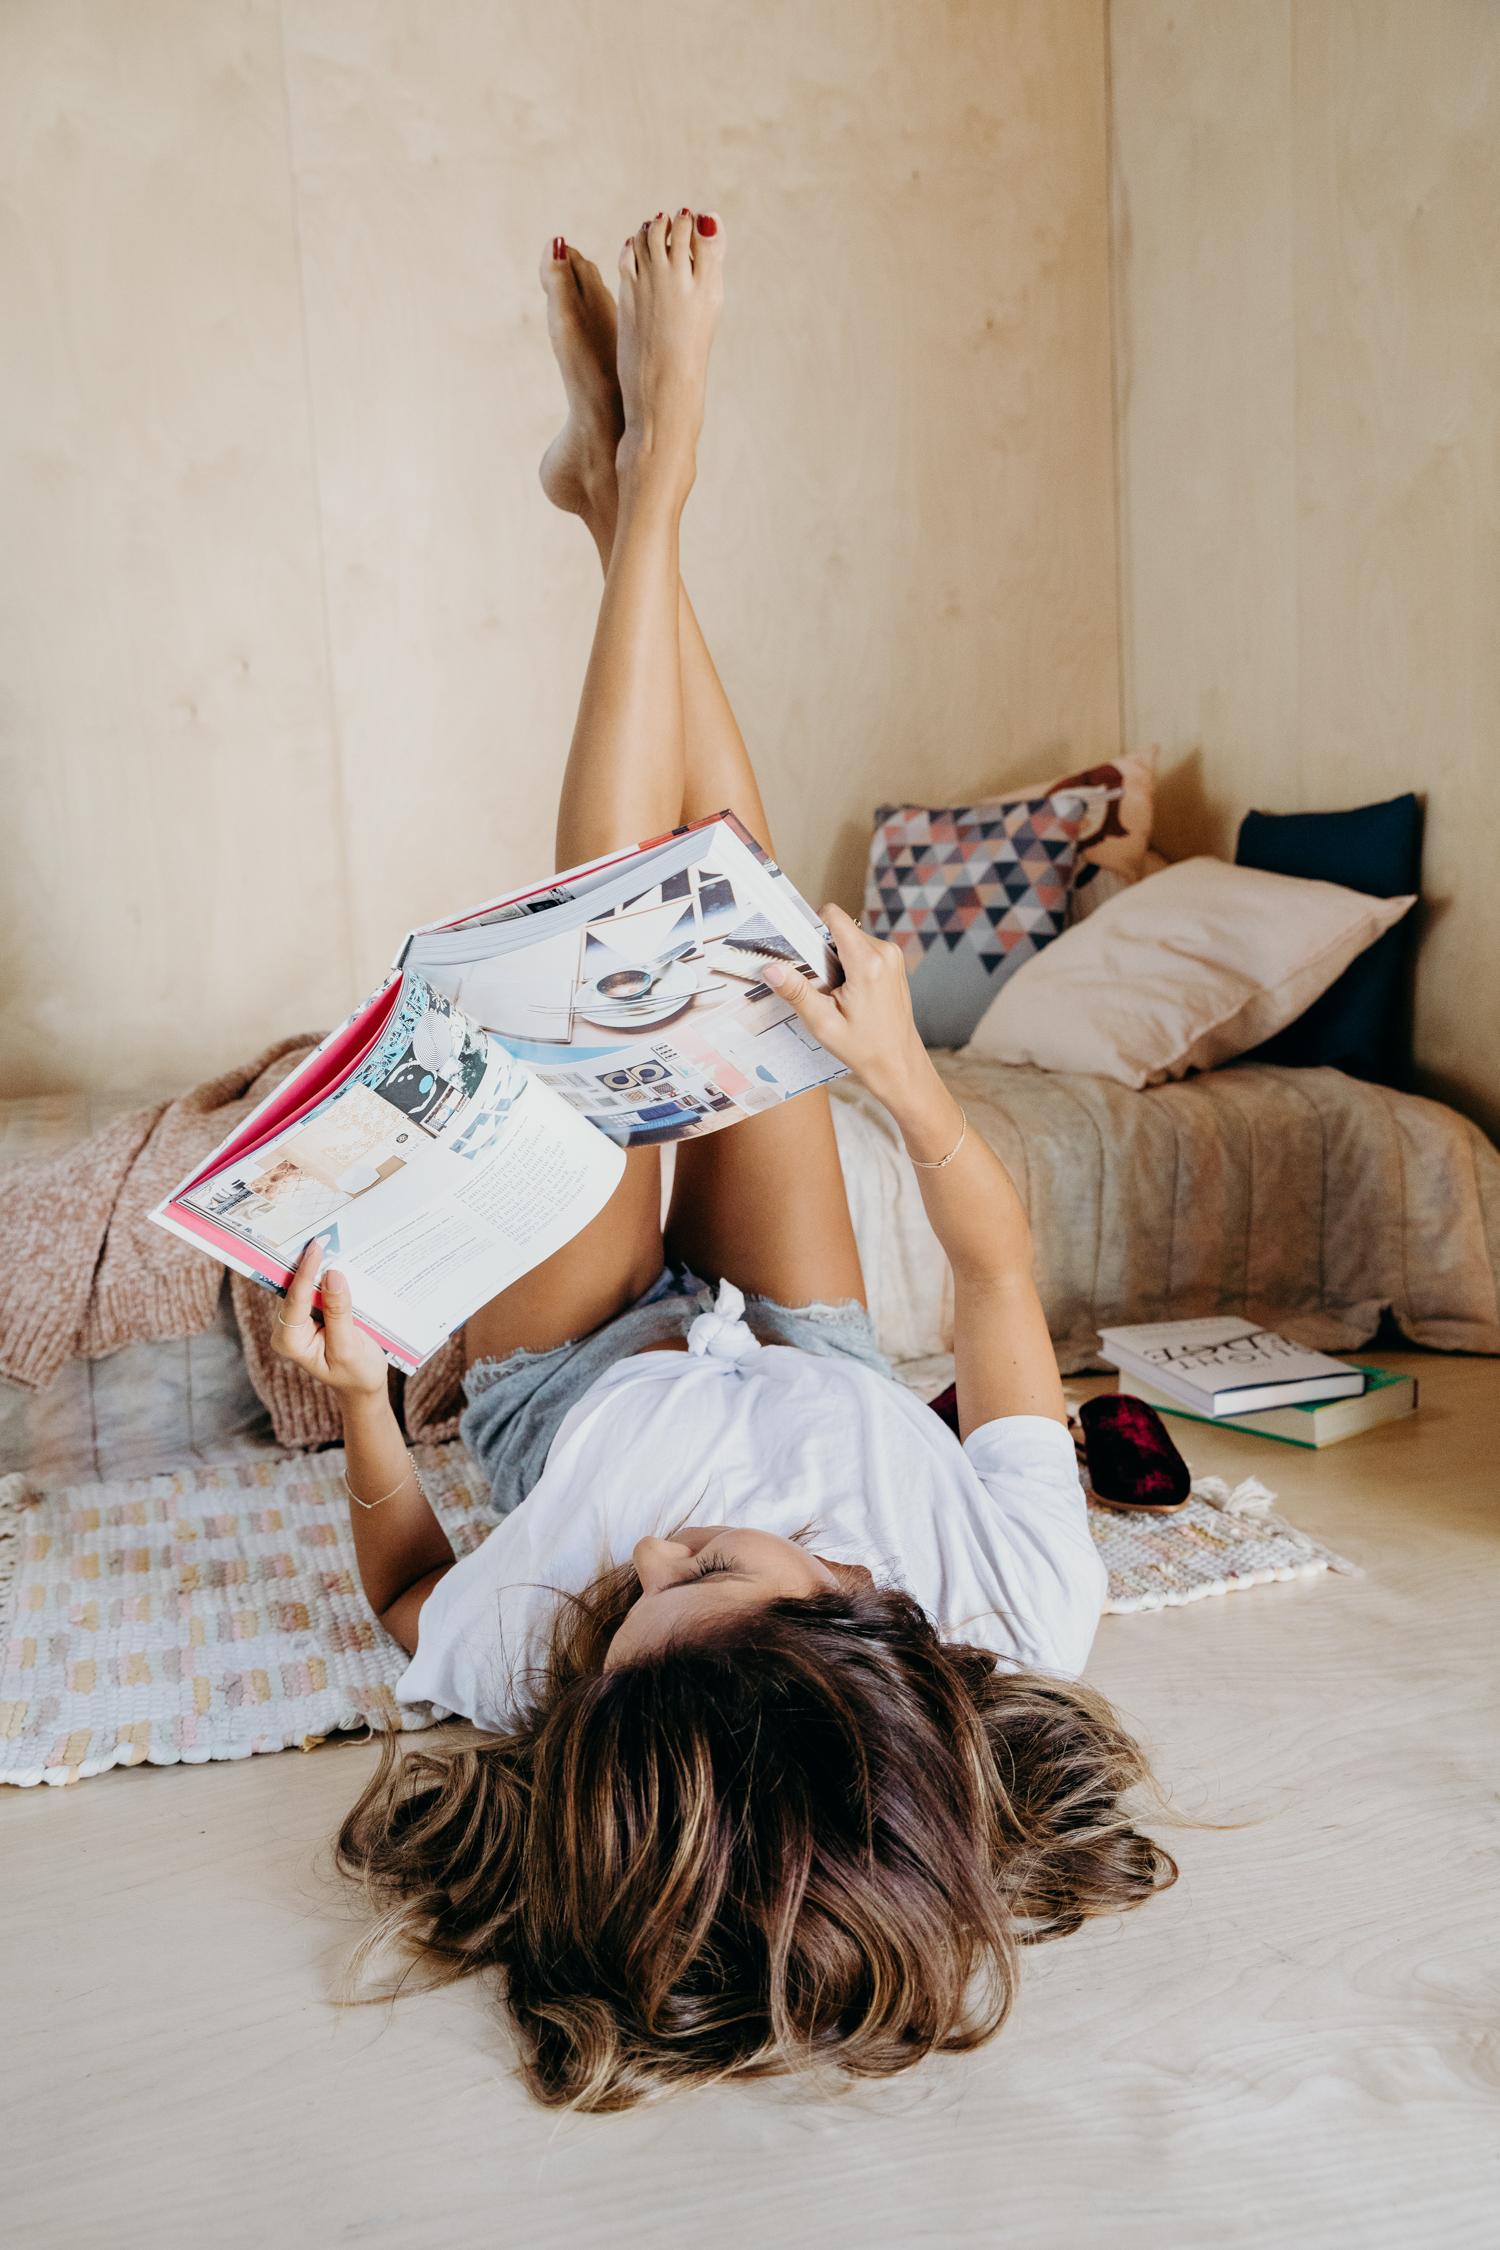 Popular Books for 20 - 30 yr old Women: Taylor Jenkins Reid + Shari Lapena